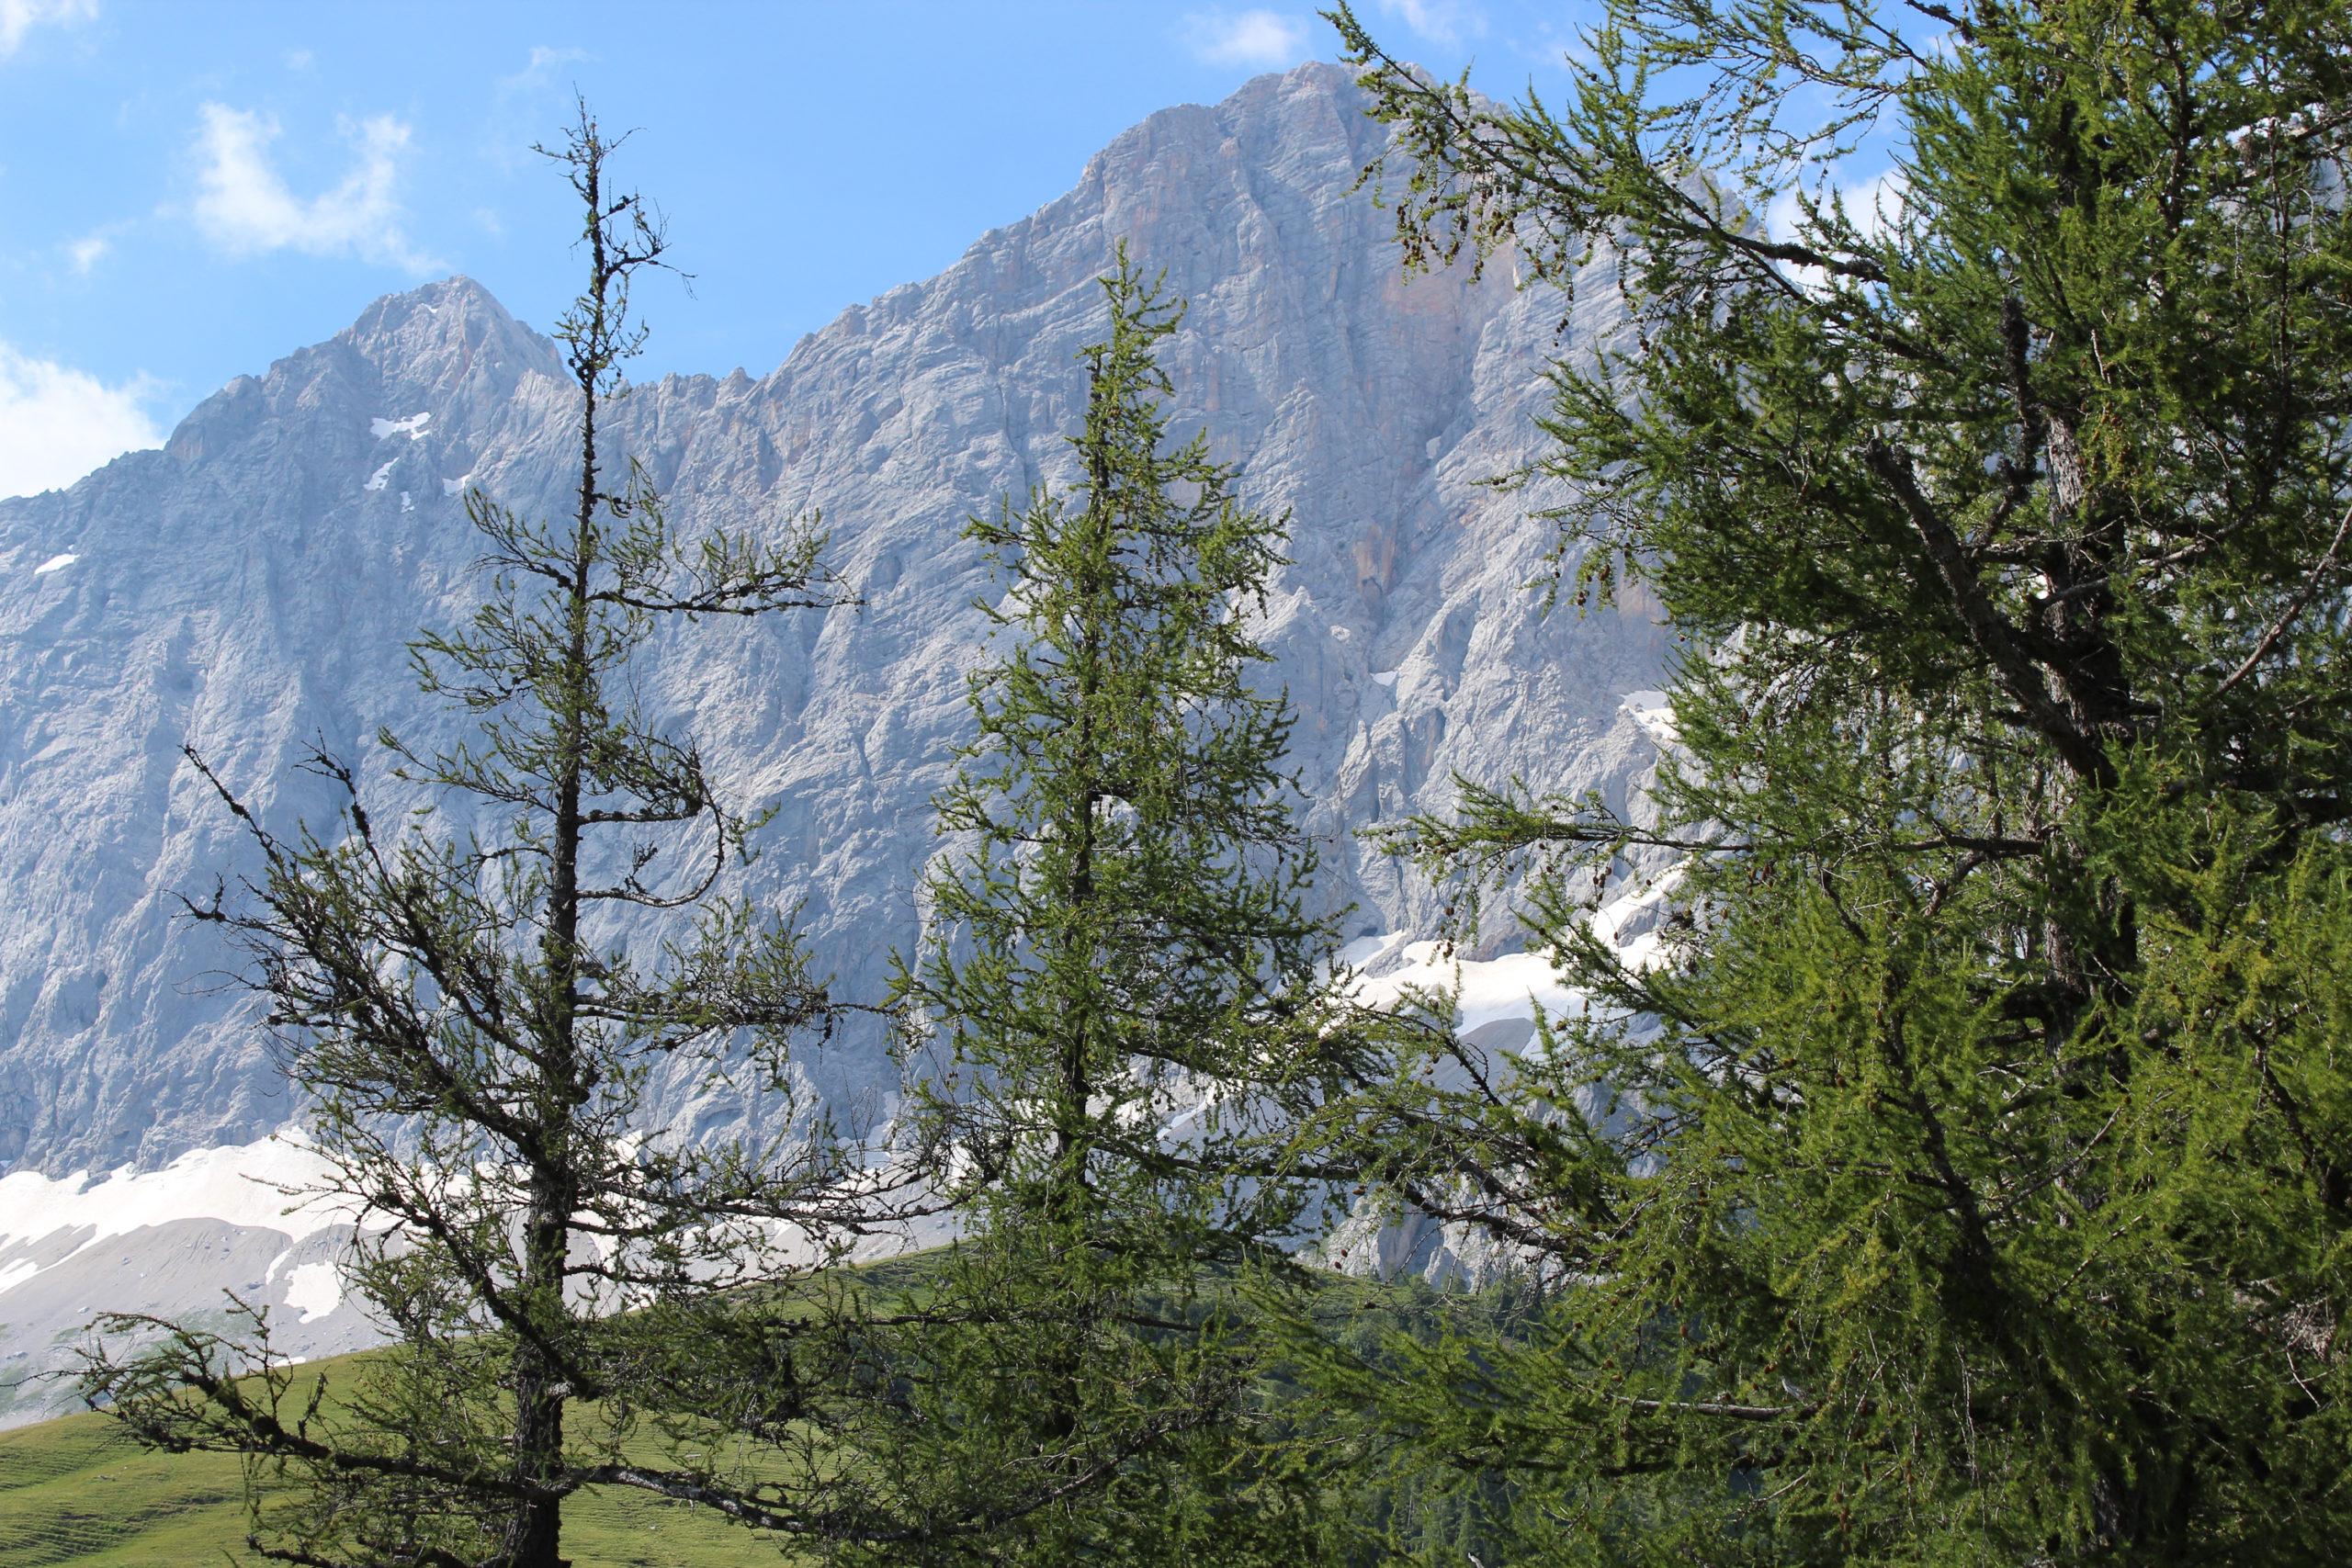 Widok na góry i drzewa